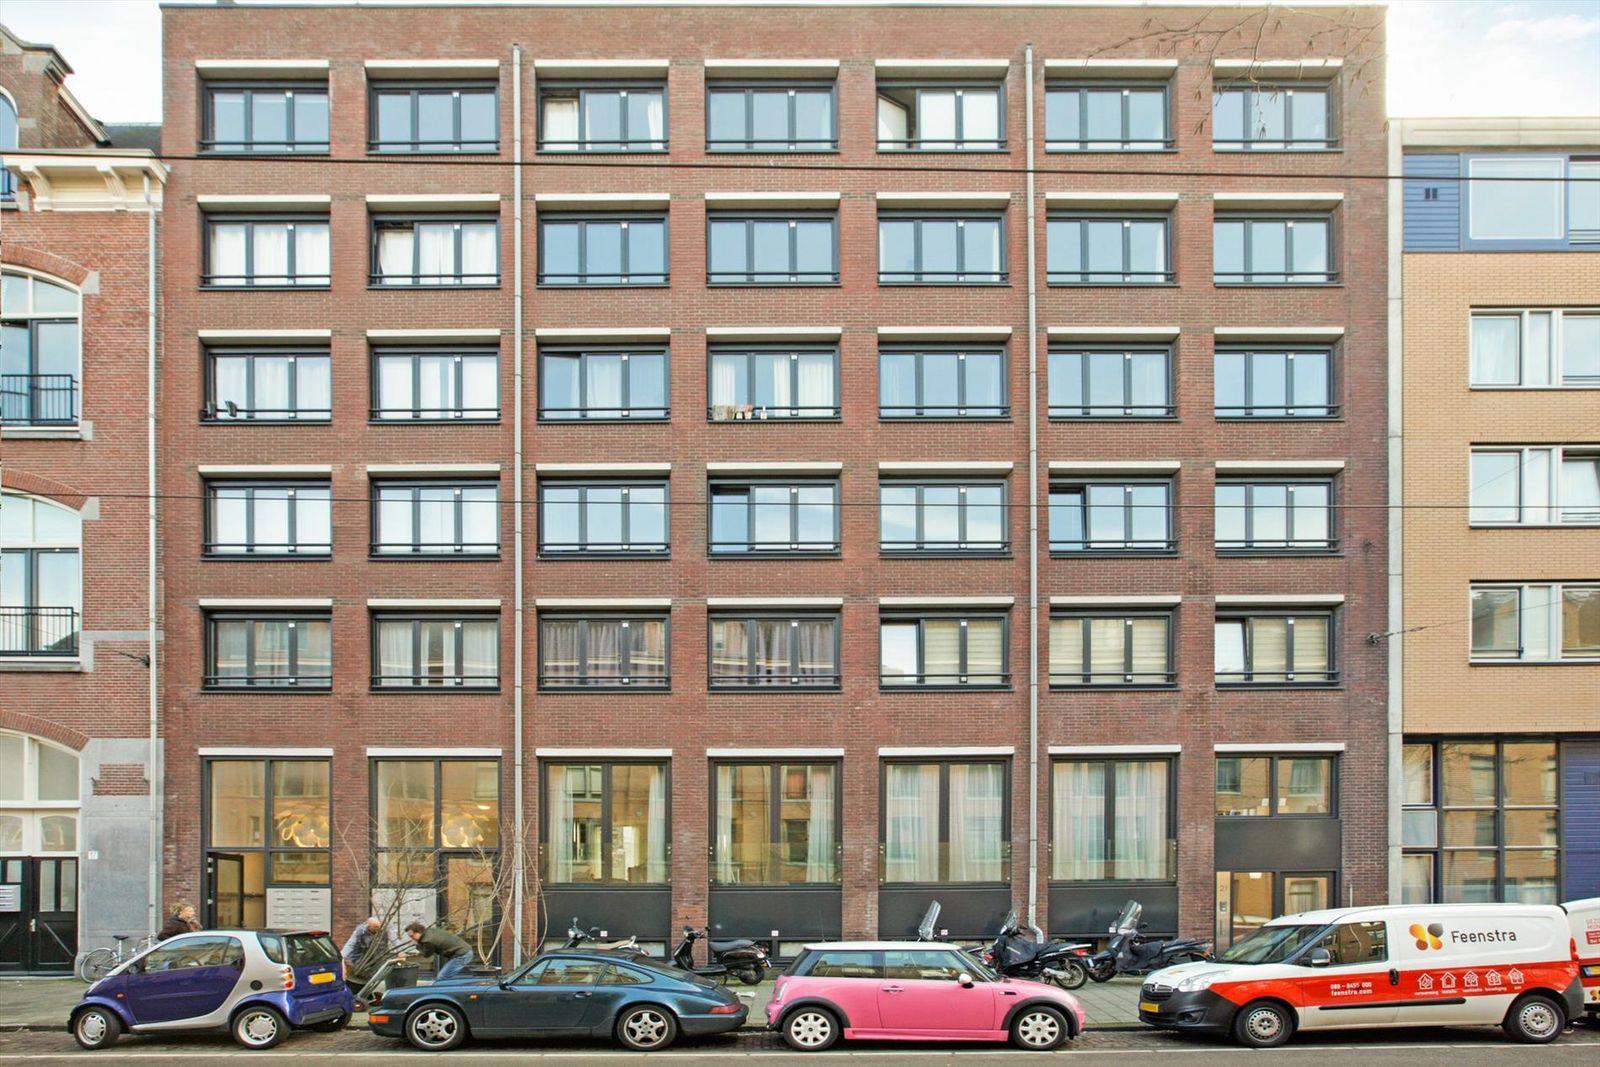 Planciusstraat 19D7, Amsterdam